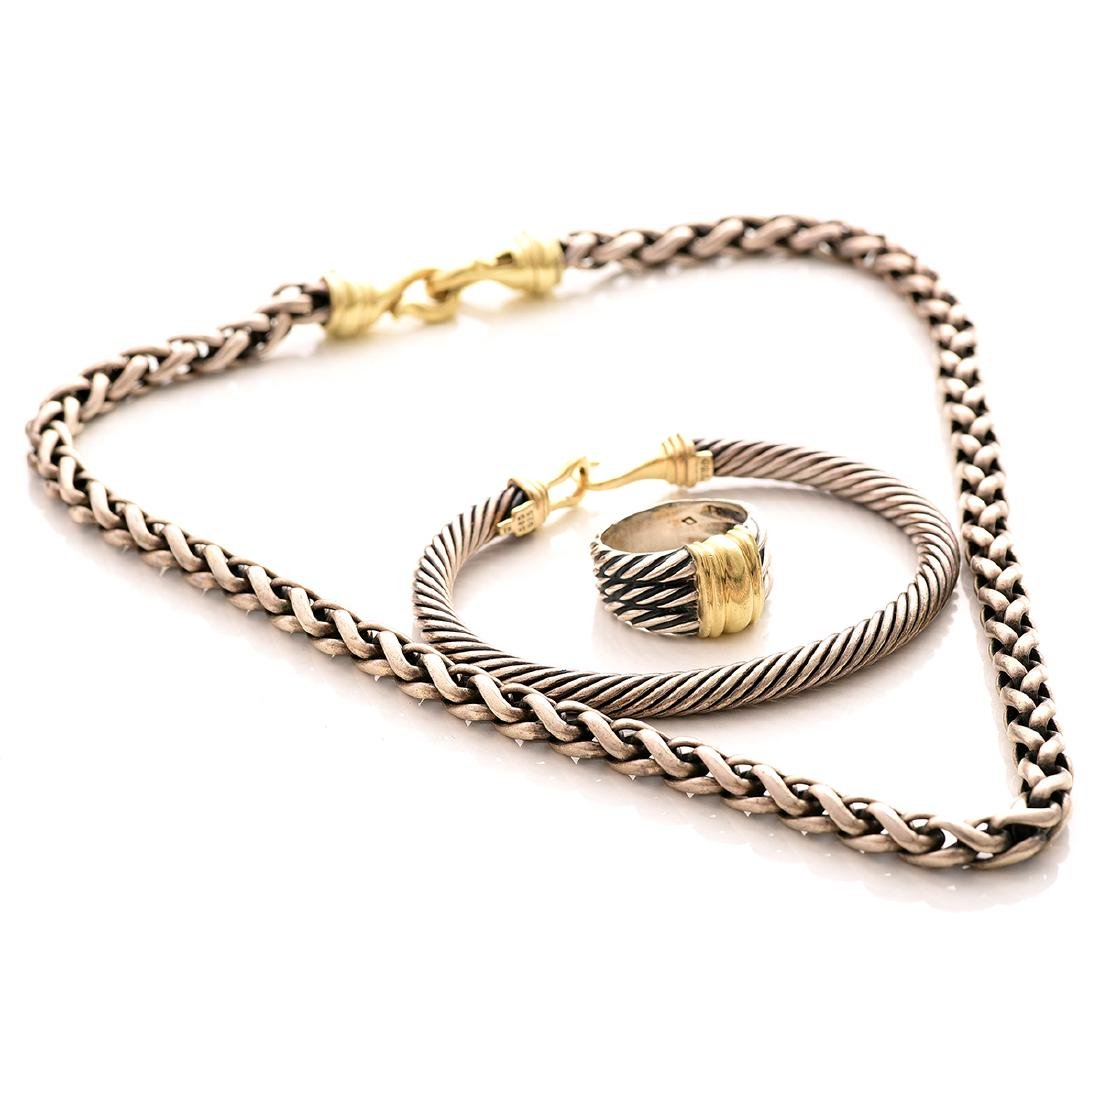 David Yurman, 14k Gold, Sterling Silver Jewelry Suite.